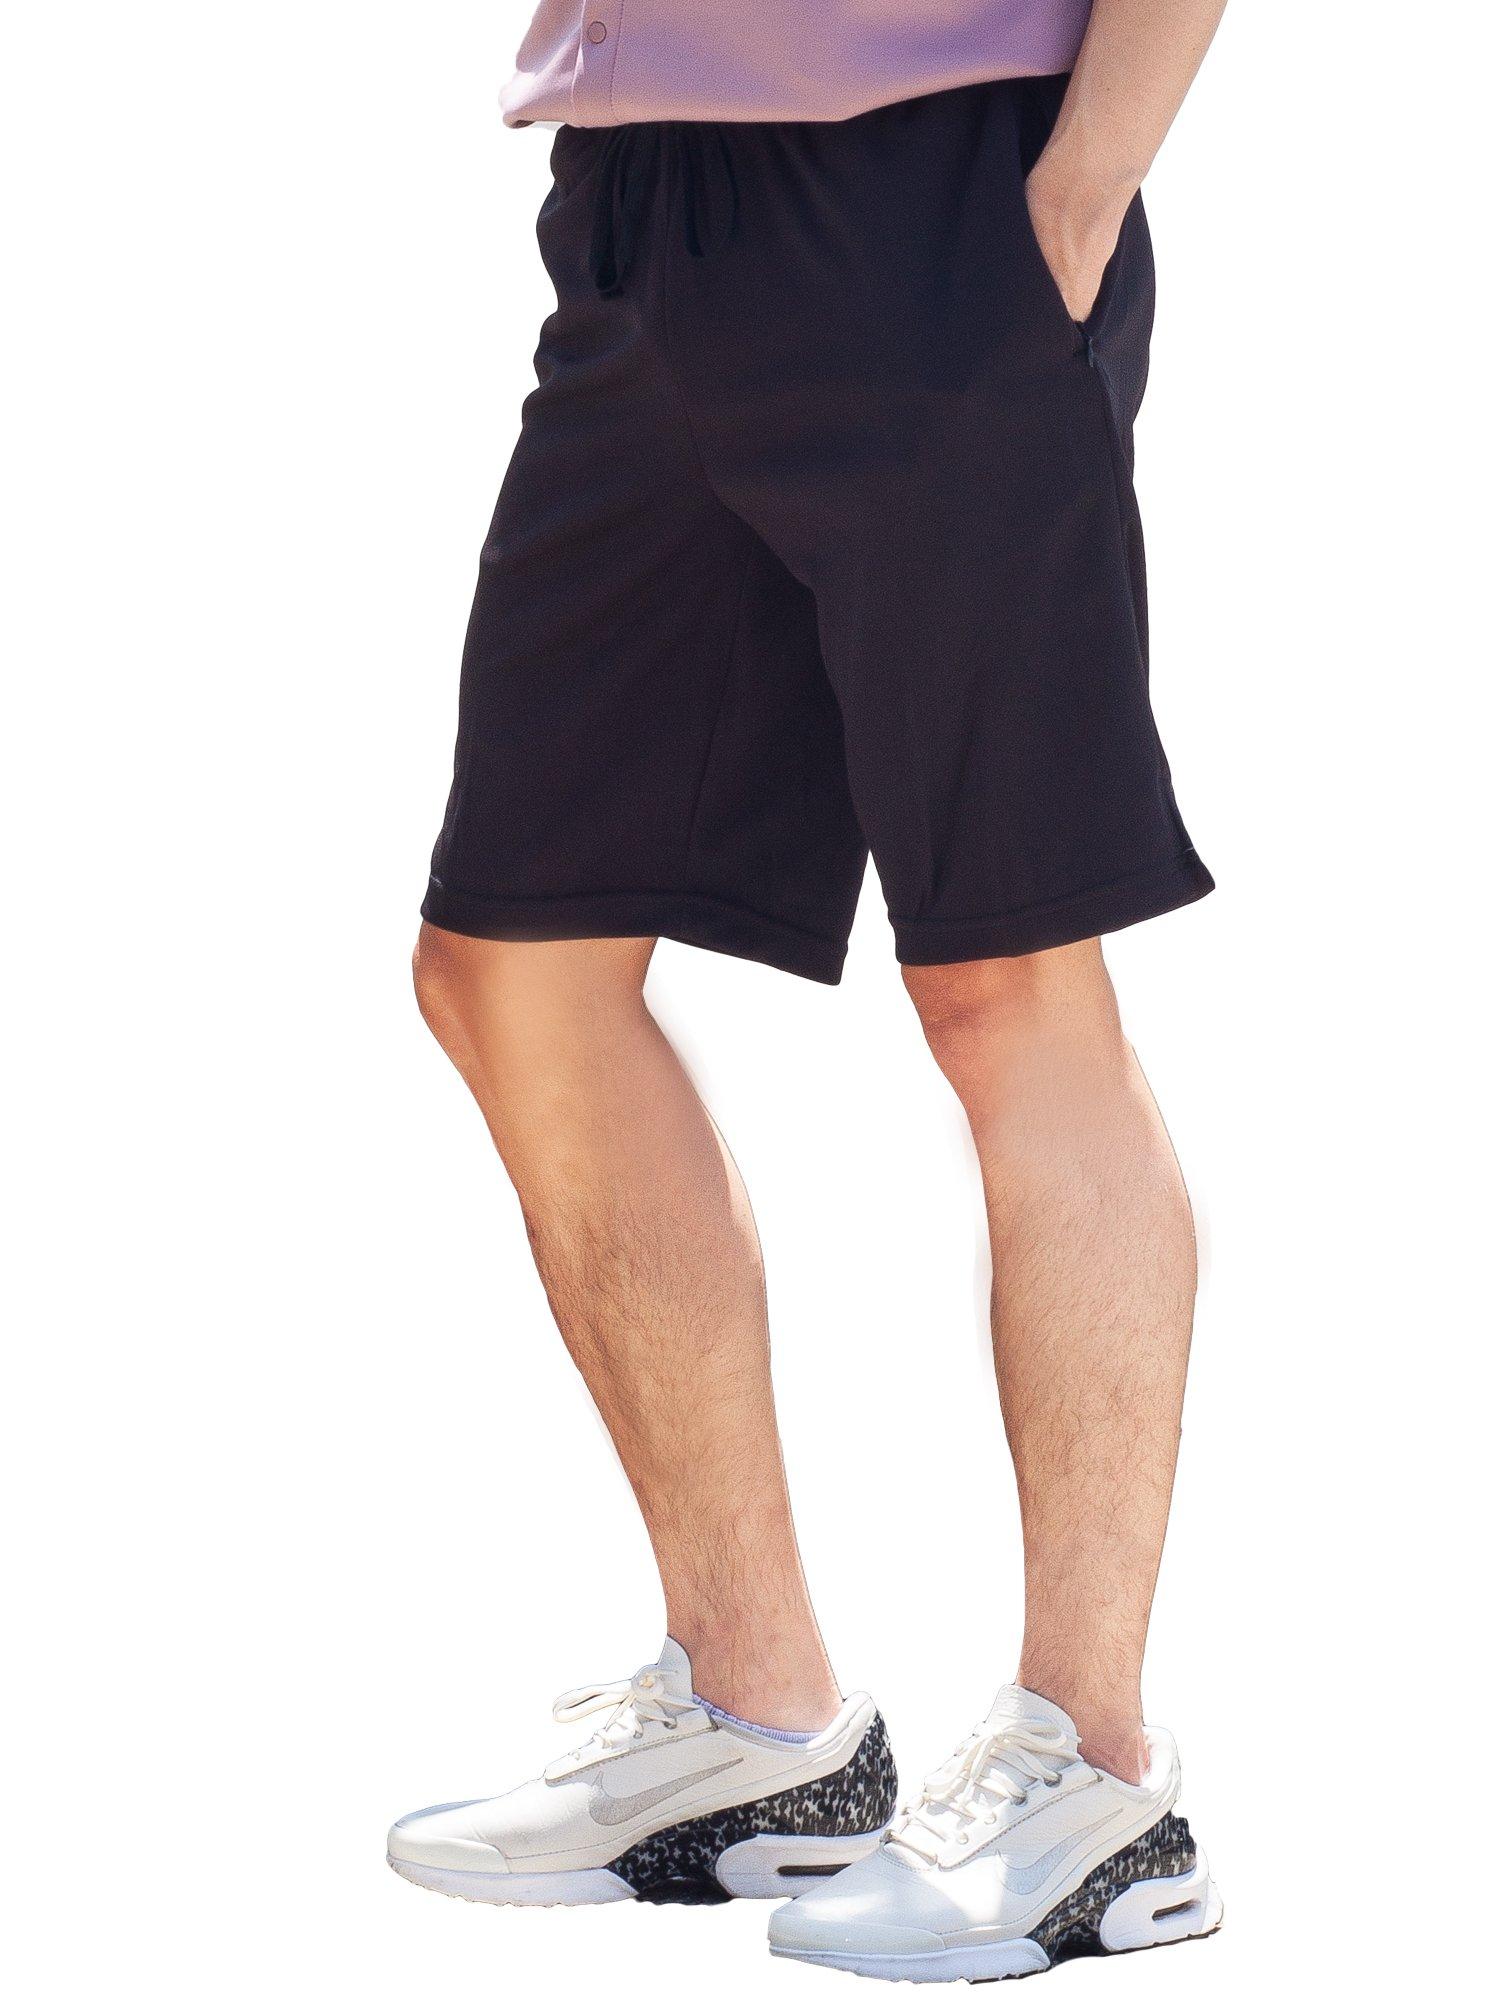 Mens Shorts with Zipper Pockets Quick Dry Travel Shorts (1XL Plus, Black)